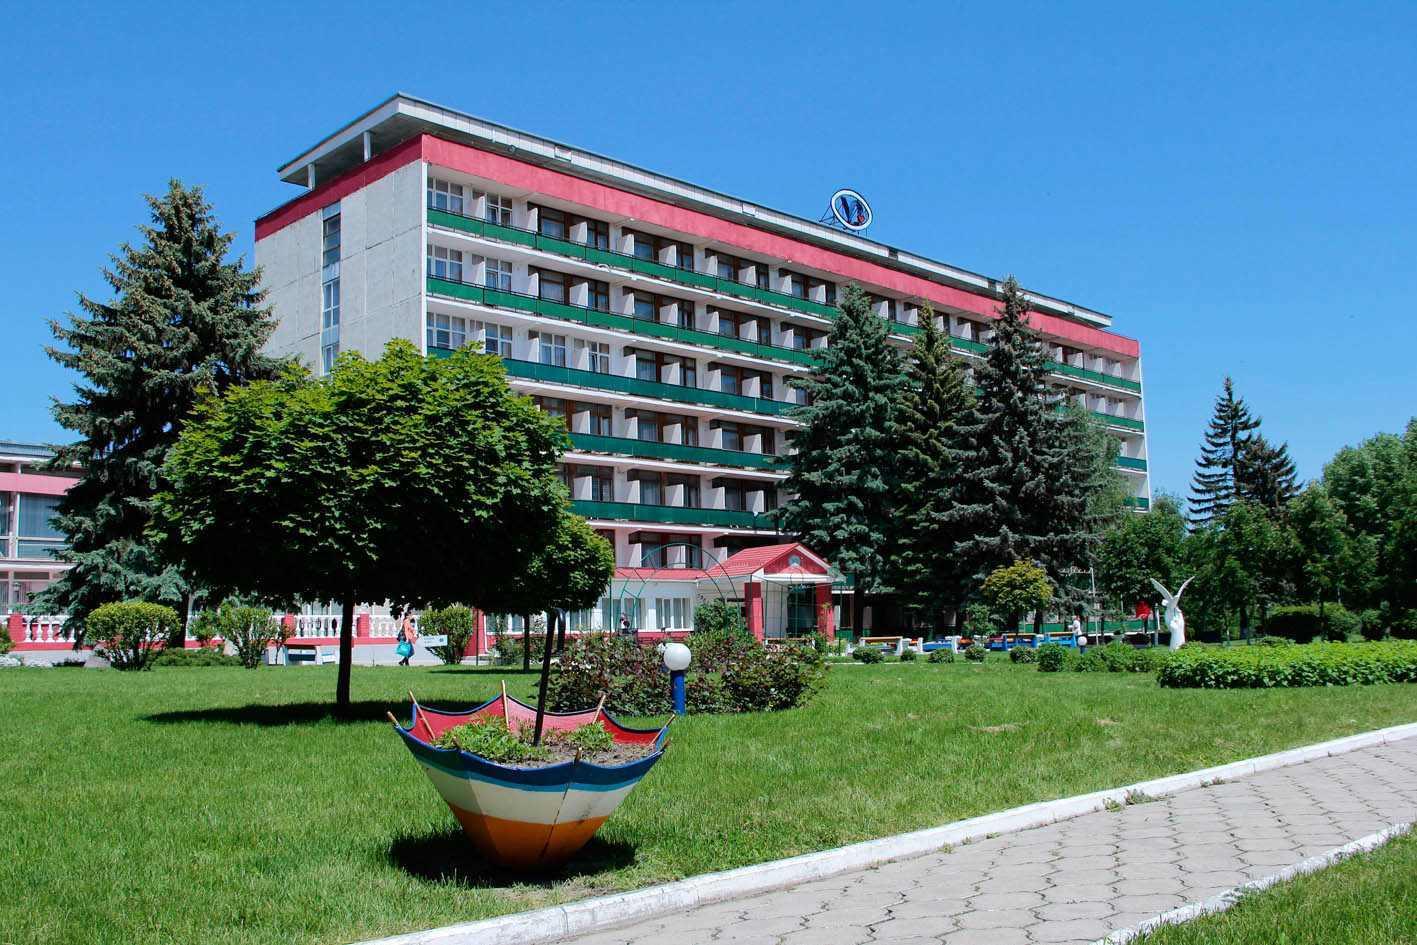 https://www.kp.ru/best/stavropol/otdykh-na-severnom-kavkaze-2018/images/tild3065-6433-4061-a433-306166346362____2.jpg